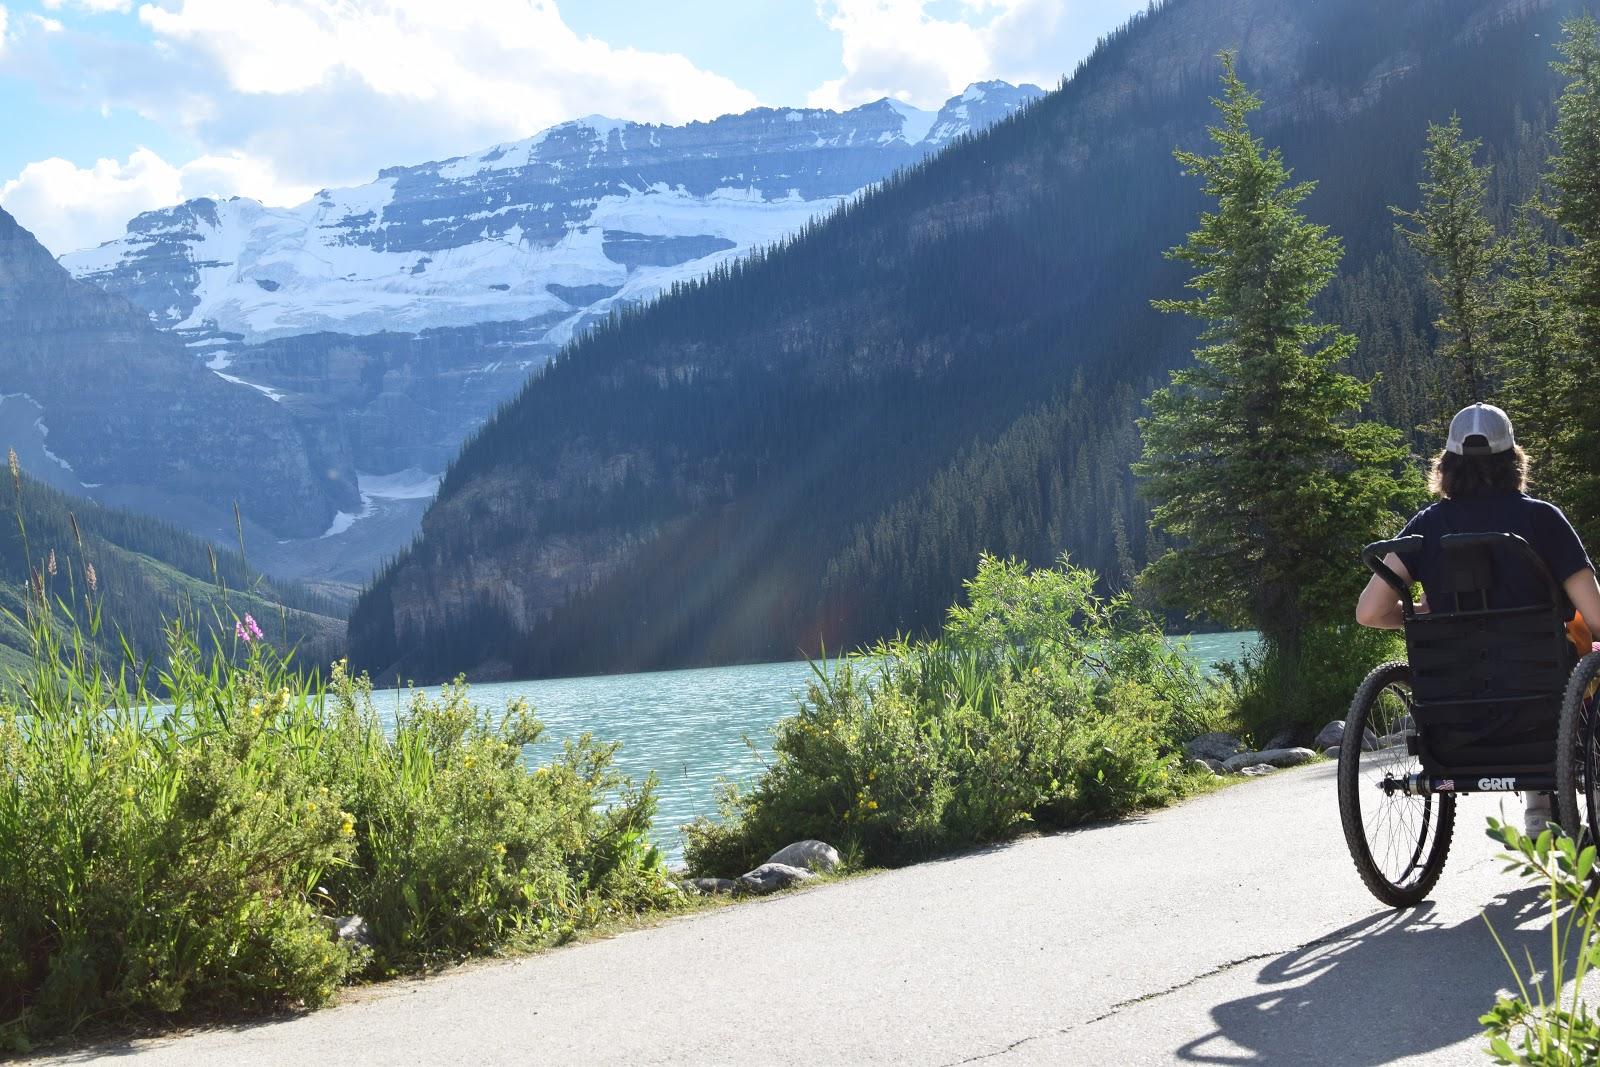 Beginning of the Lake Louise Lakeside Trail